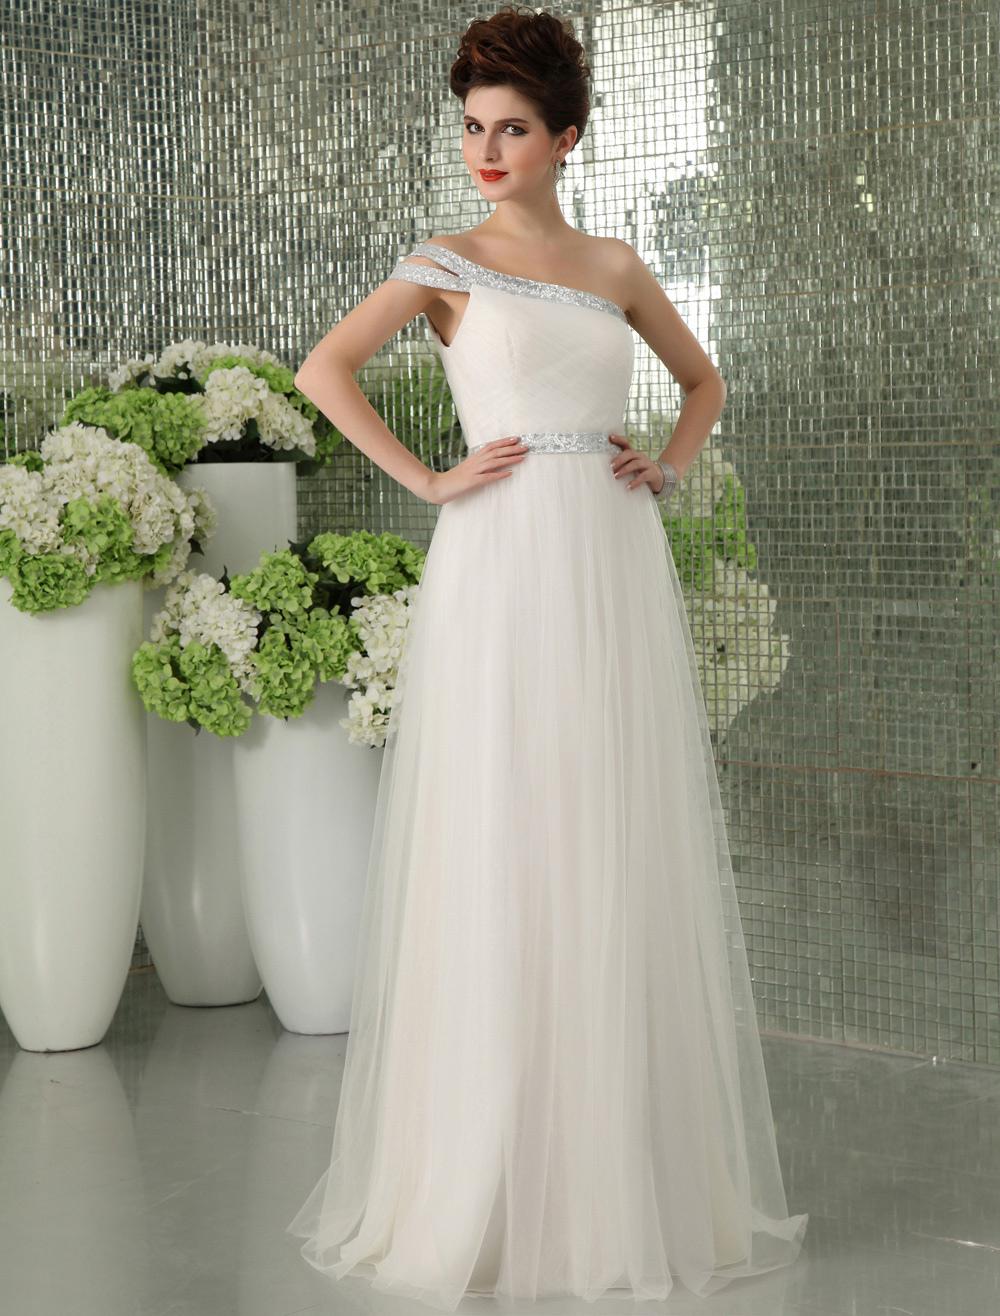 White Net Lace One-Shoulder Sexy Evening Dress Milanoo (Wedding Evening Dresses) photo